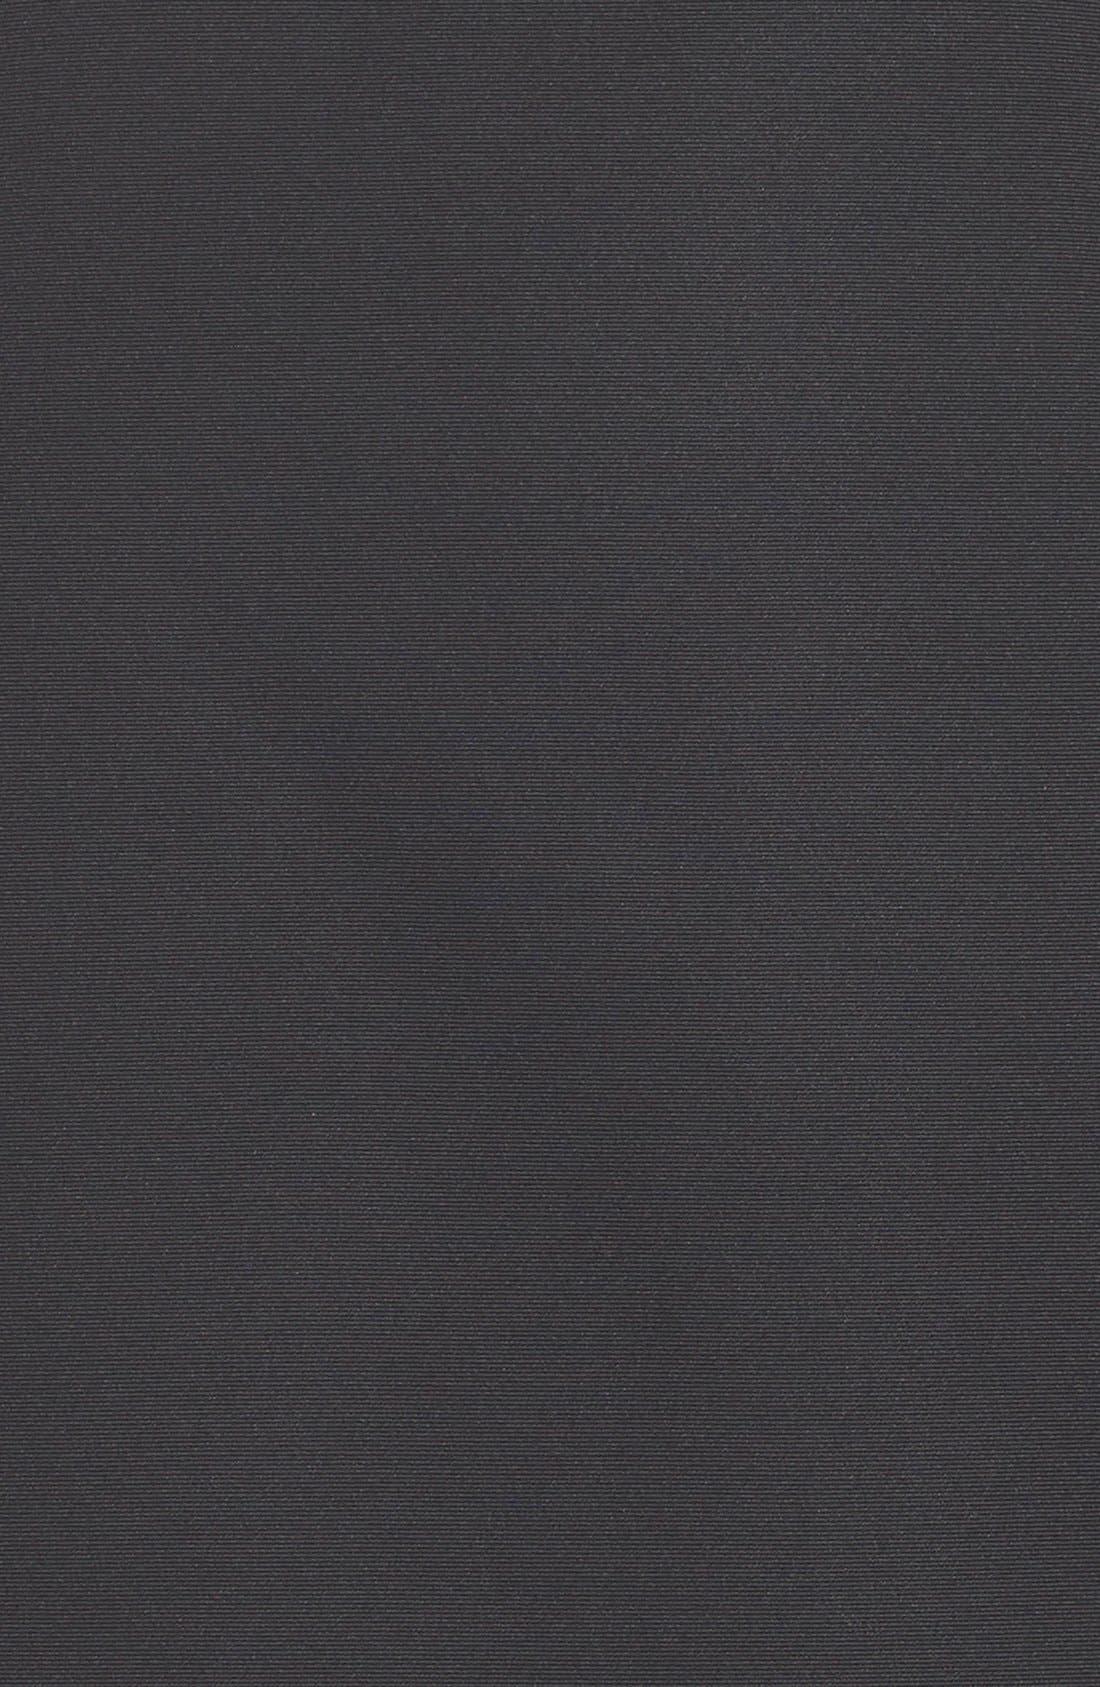 Alternate Image 4  - HalstonHeritage Strapless Satin Fit & Flare Dress